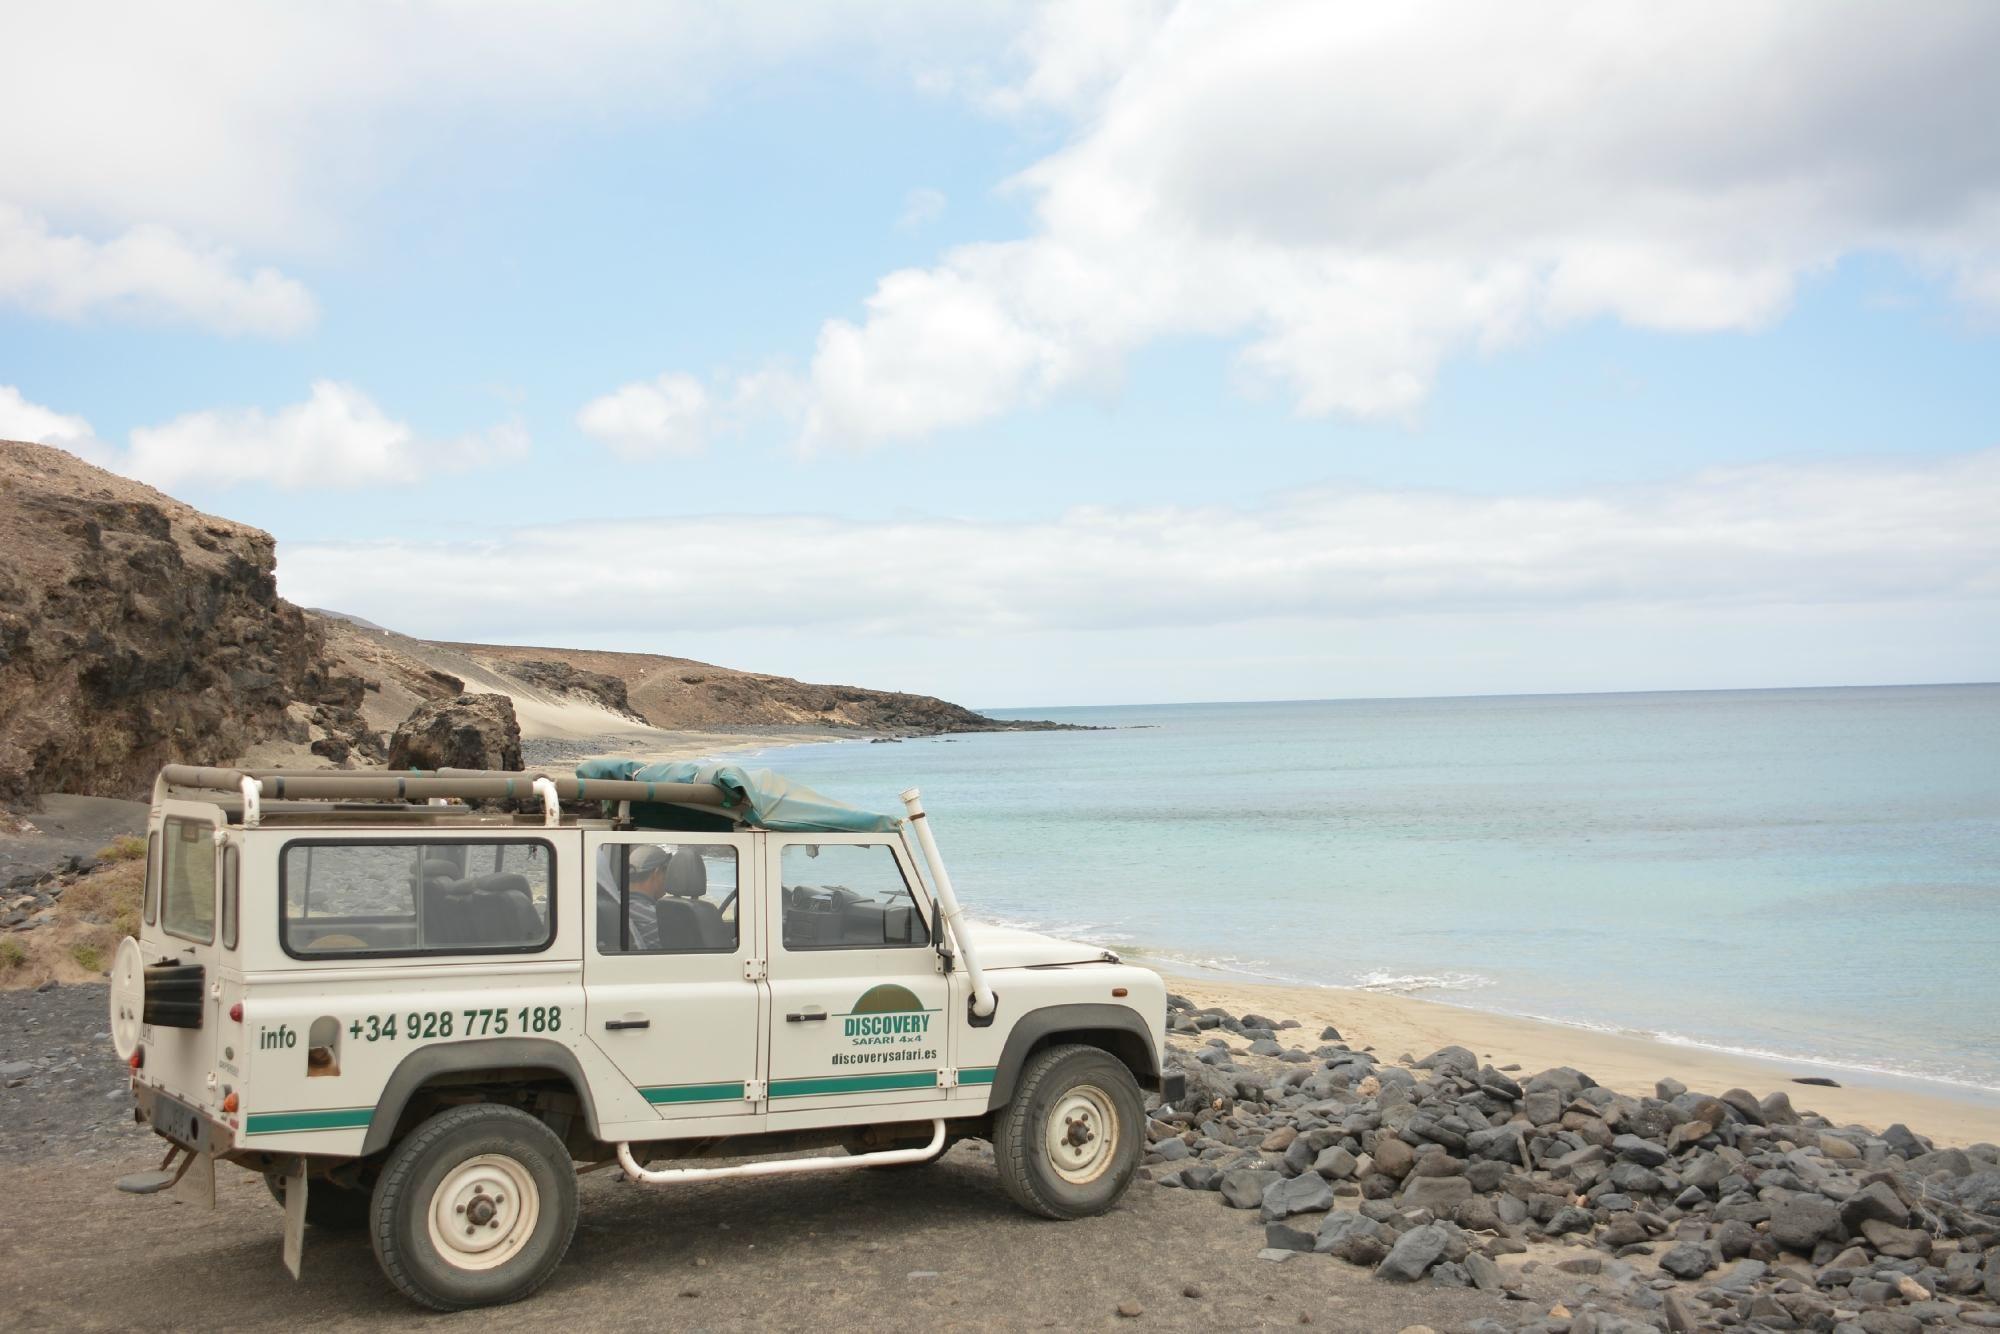 Discovery Safari Fuerteventura See 116 Reviews Articles And 154 Photos Of Discovery Safari Ranked No 36 On Fuerteventura Trip Advisor Fuerteventura Island